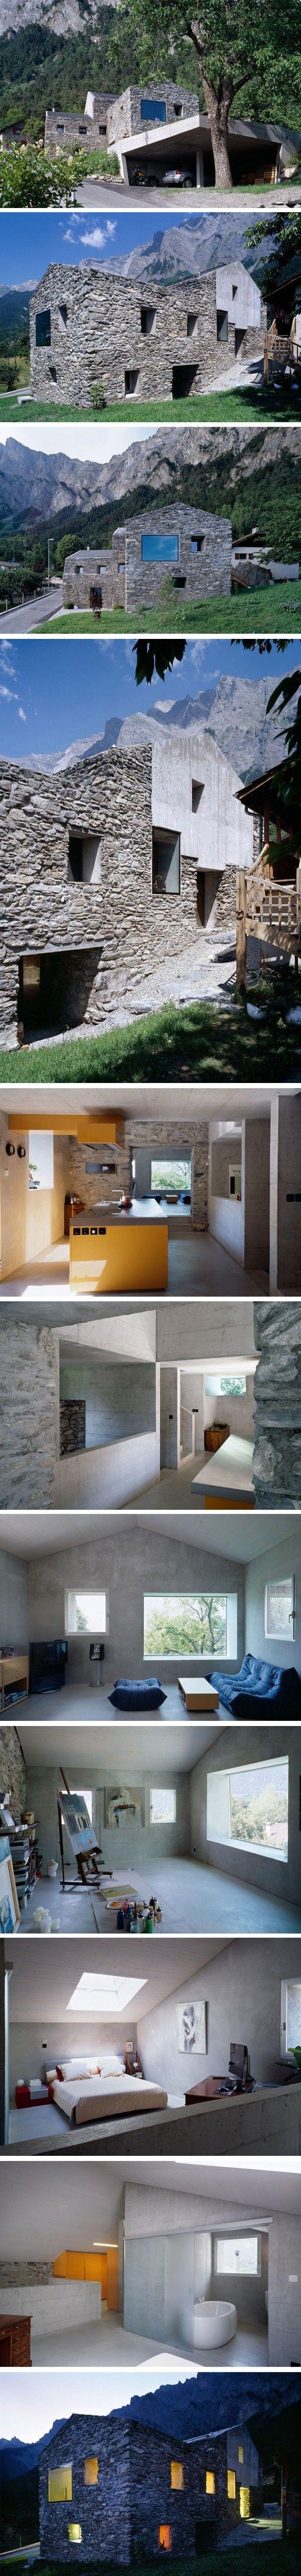 Rénovation à Chamoson / Savioz Fabrizzi Architecte